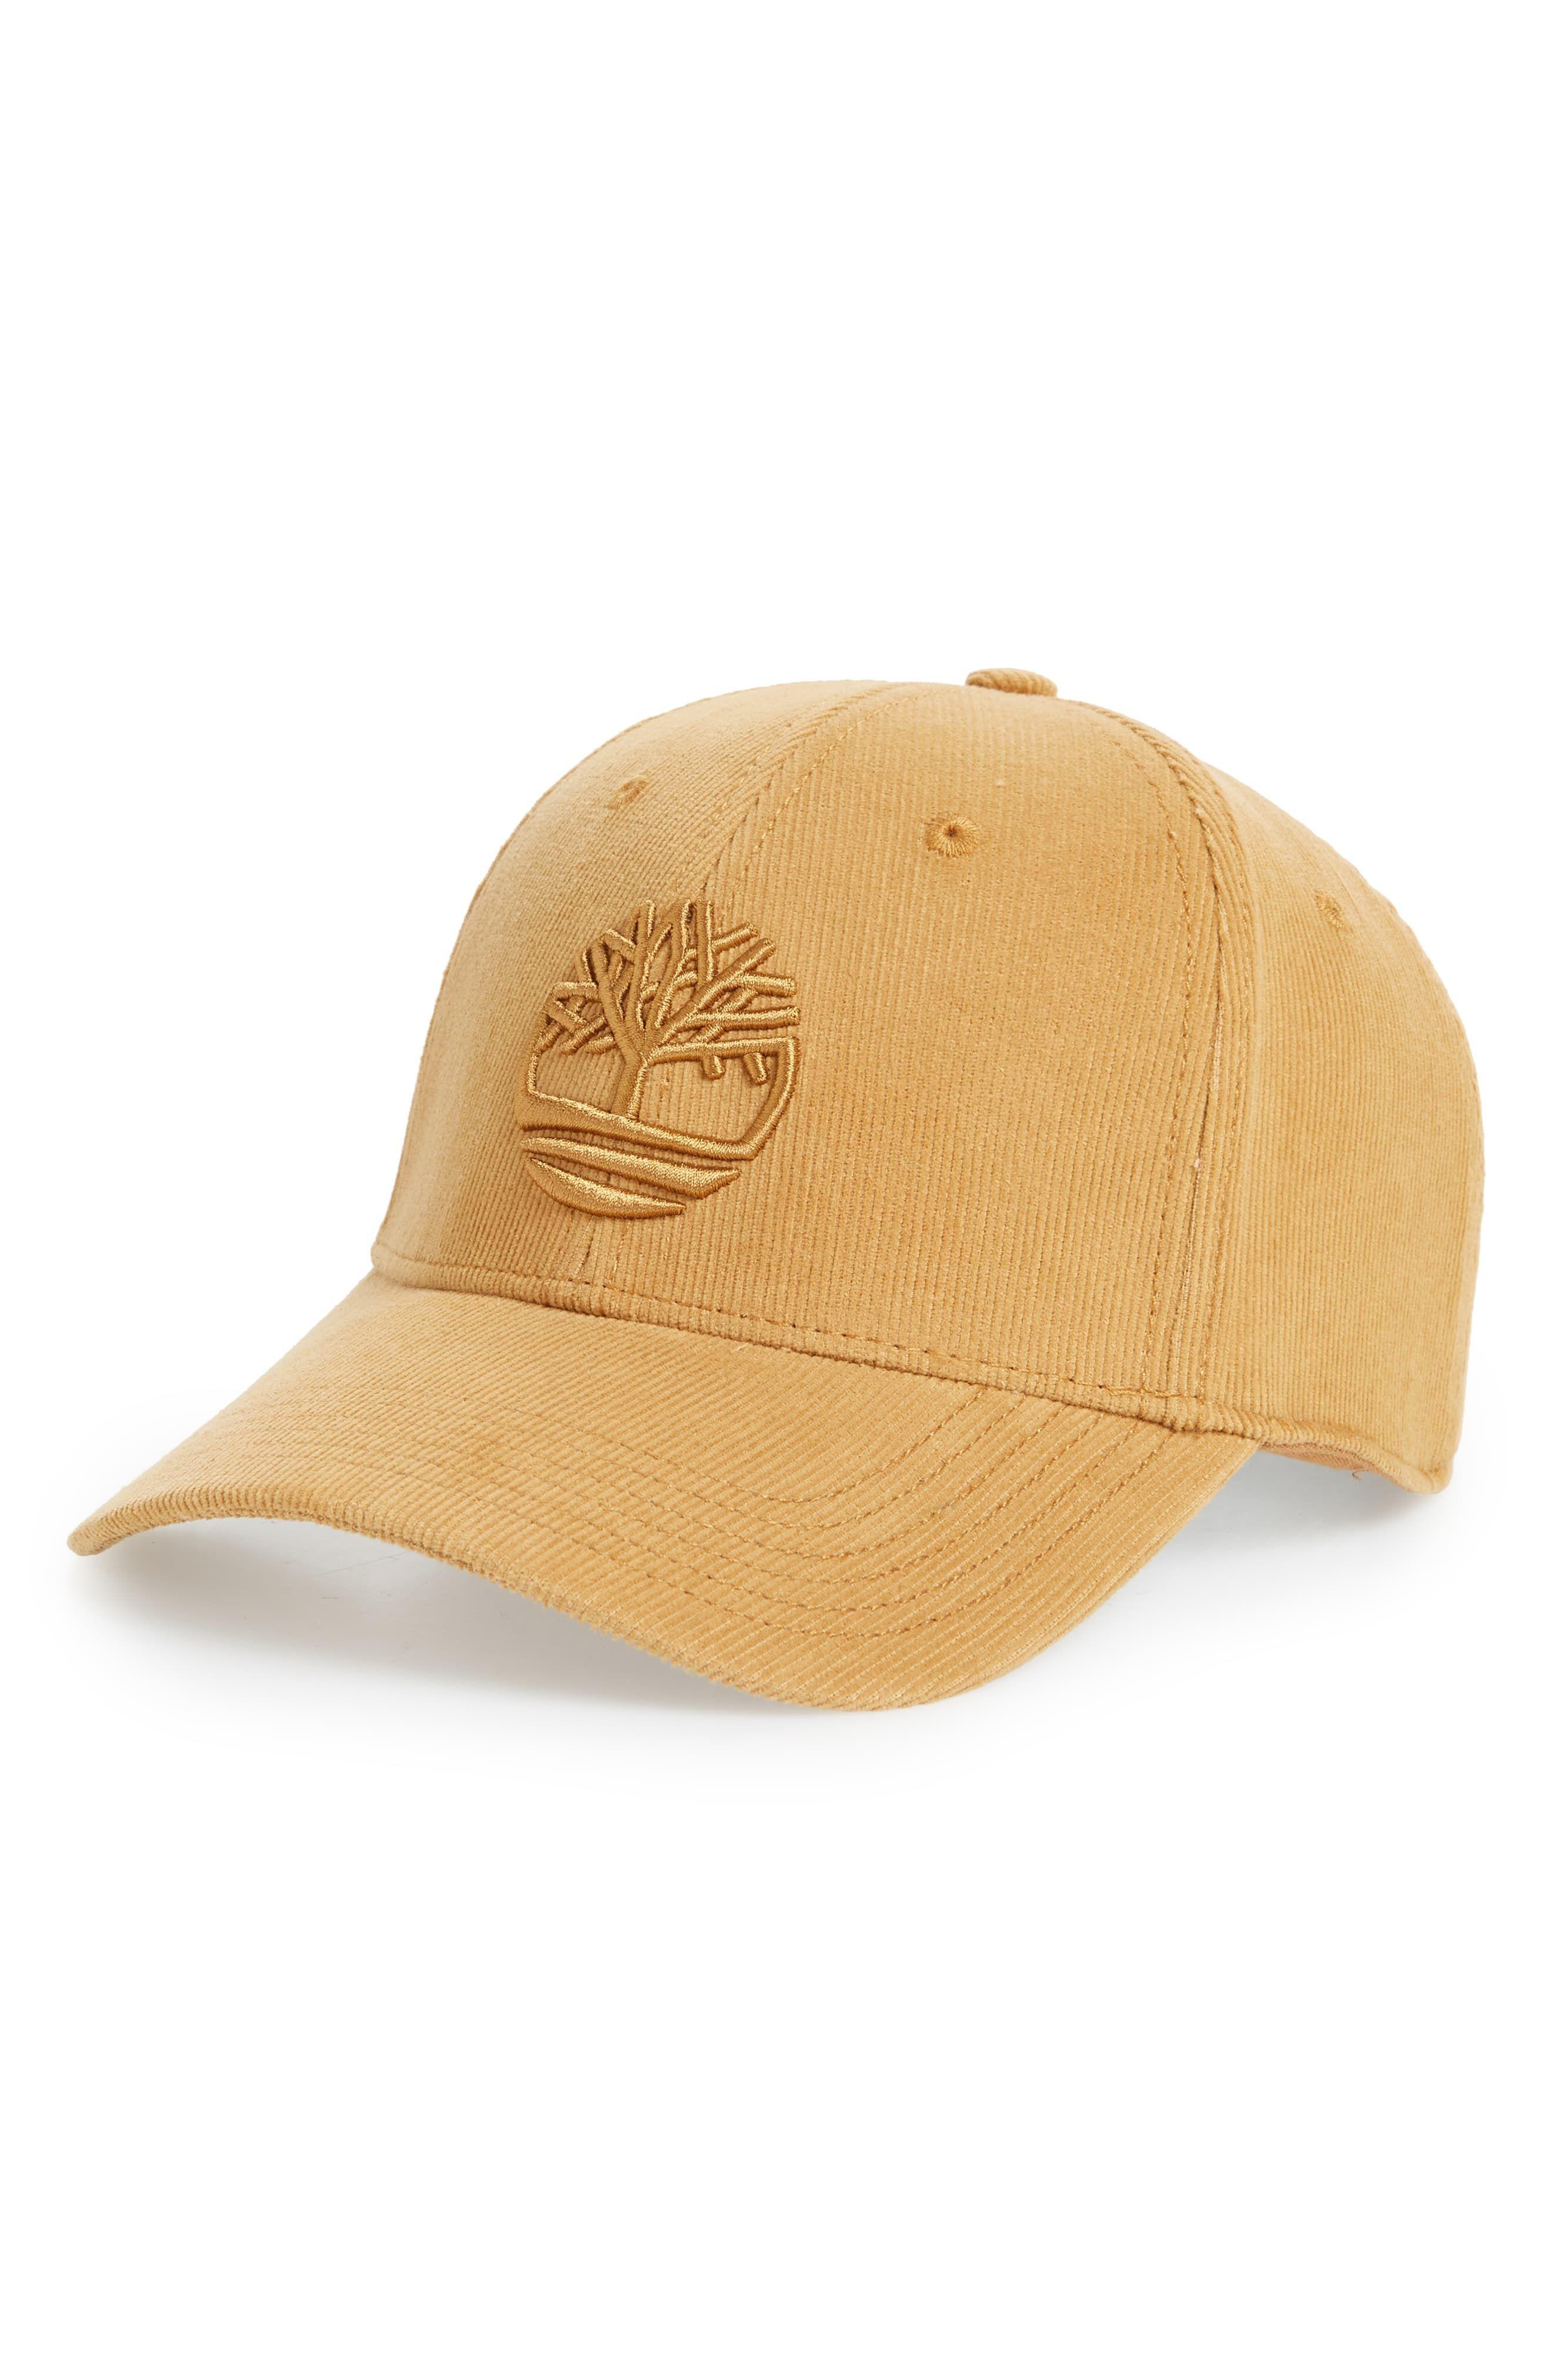 Men's Timberland Logo Embroidered Corduroy Ball Cap Brown